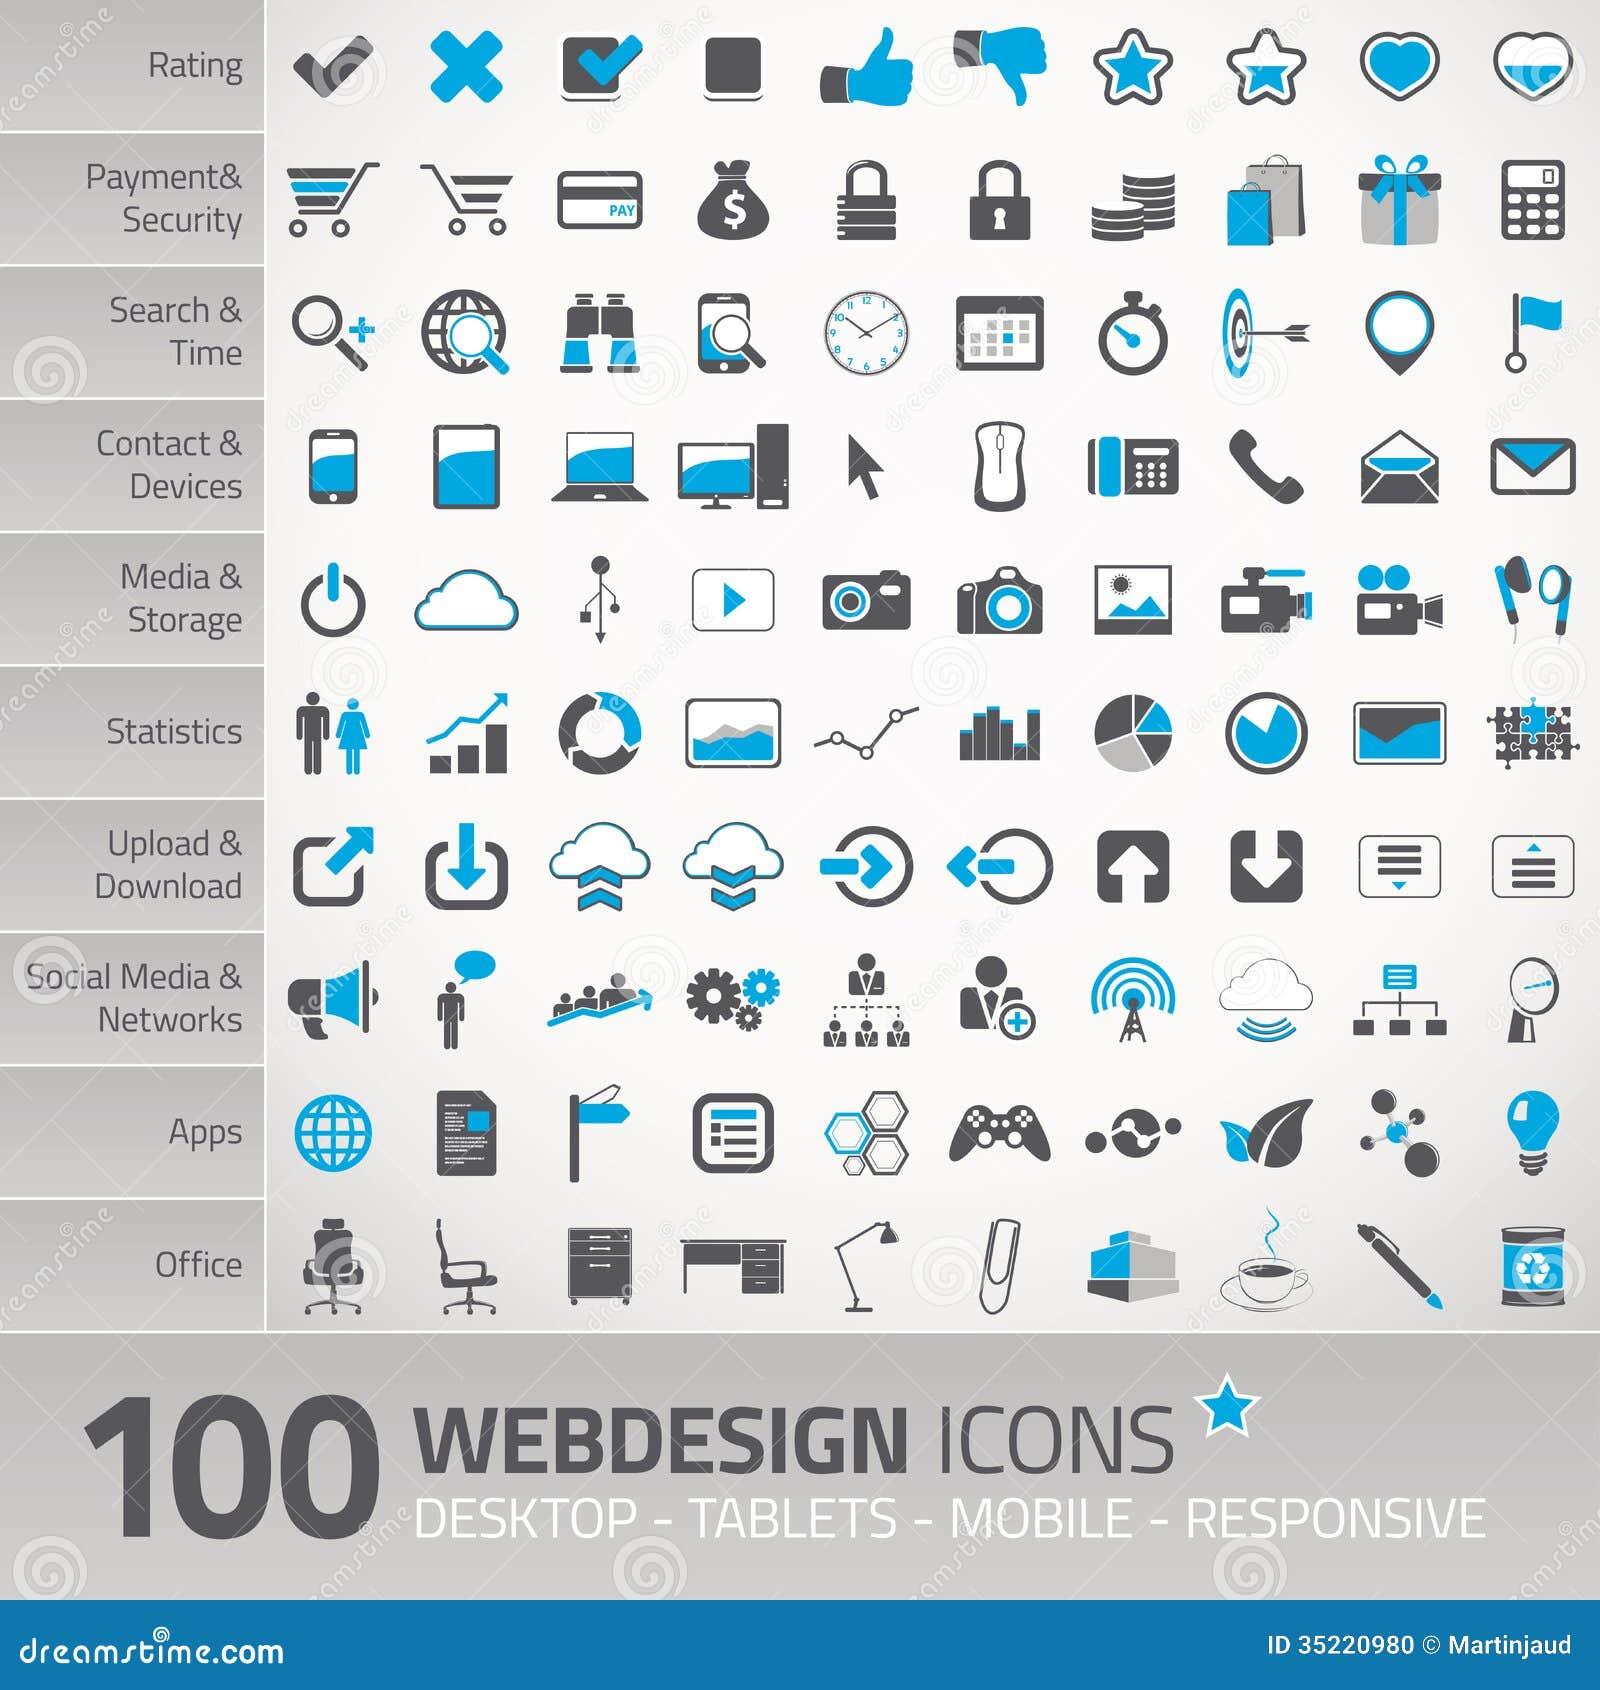 Web Design Icons - marwer